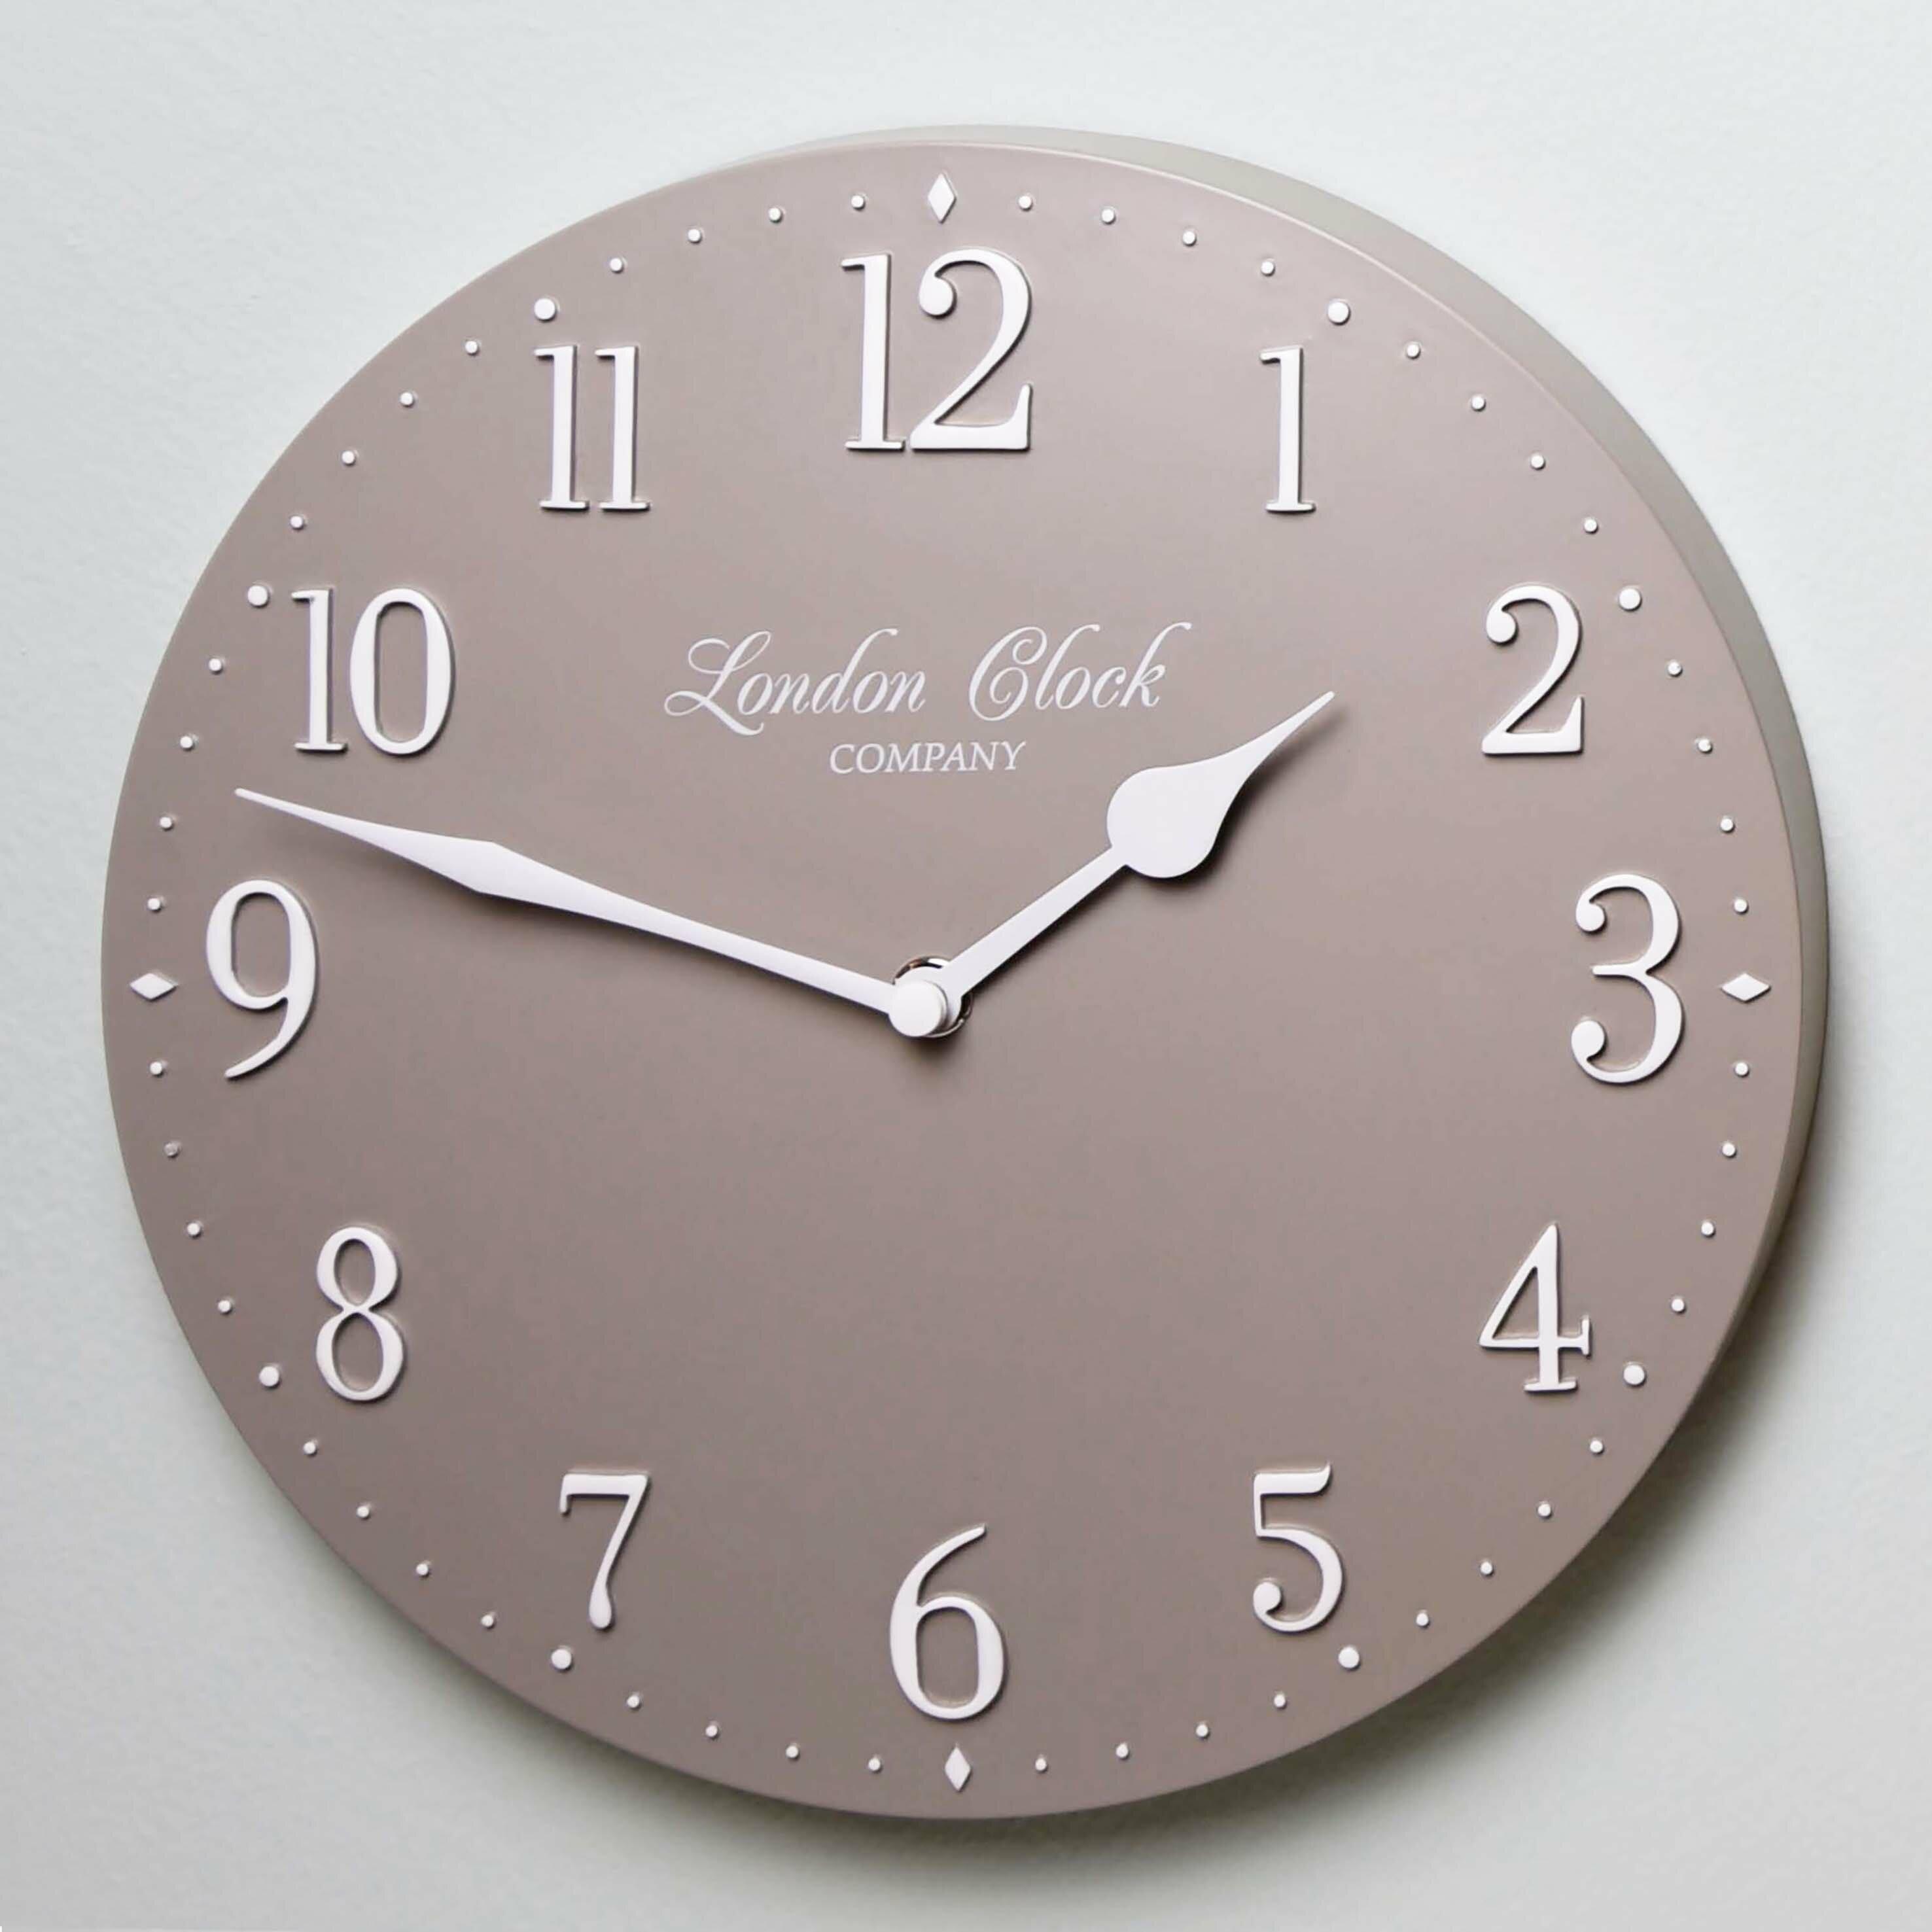 London clock company wanduhr amelia 25 cm reviews - Wanduhr 100 cm ...